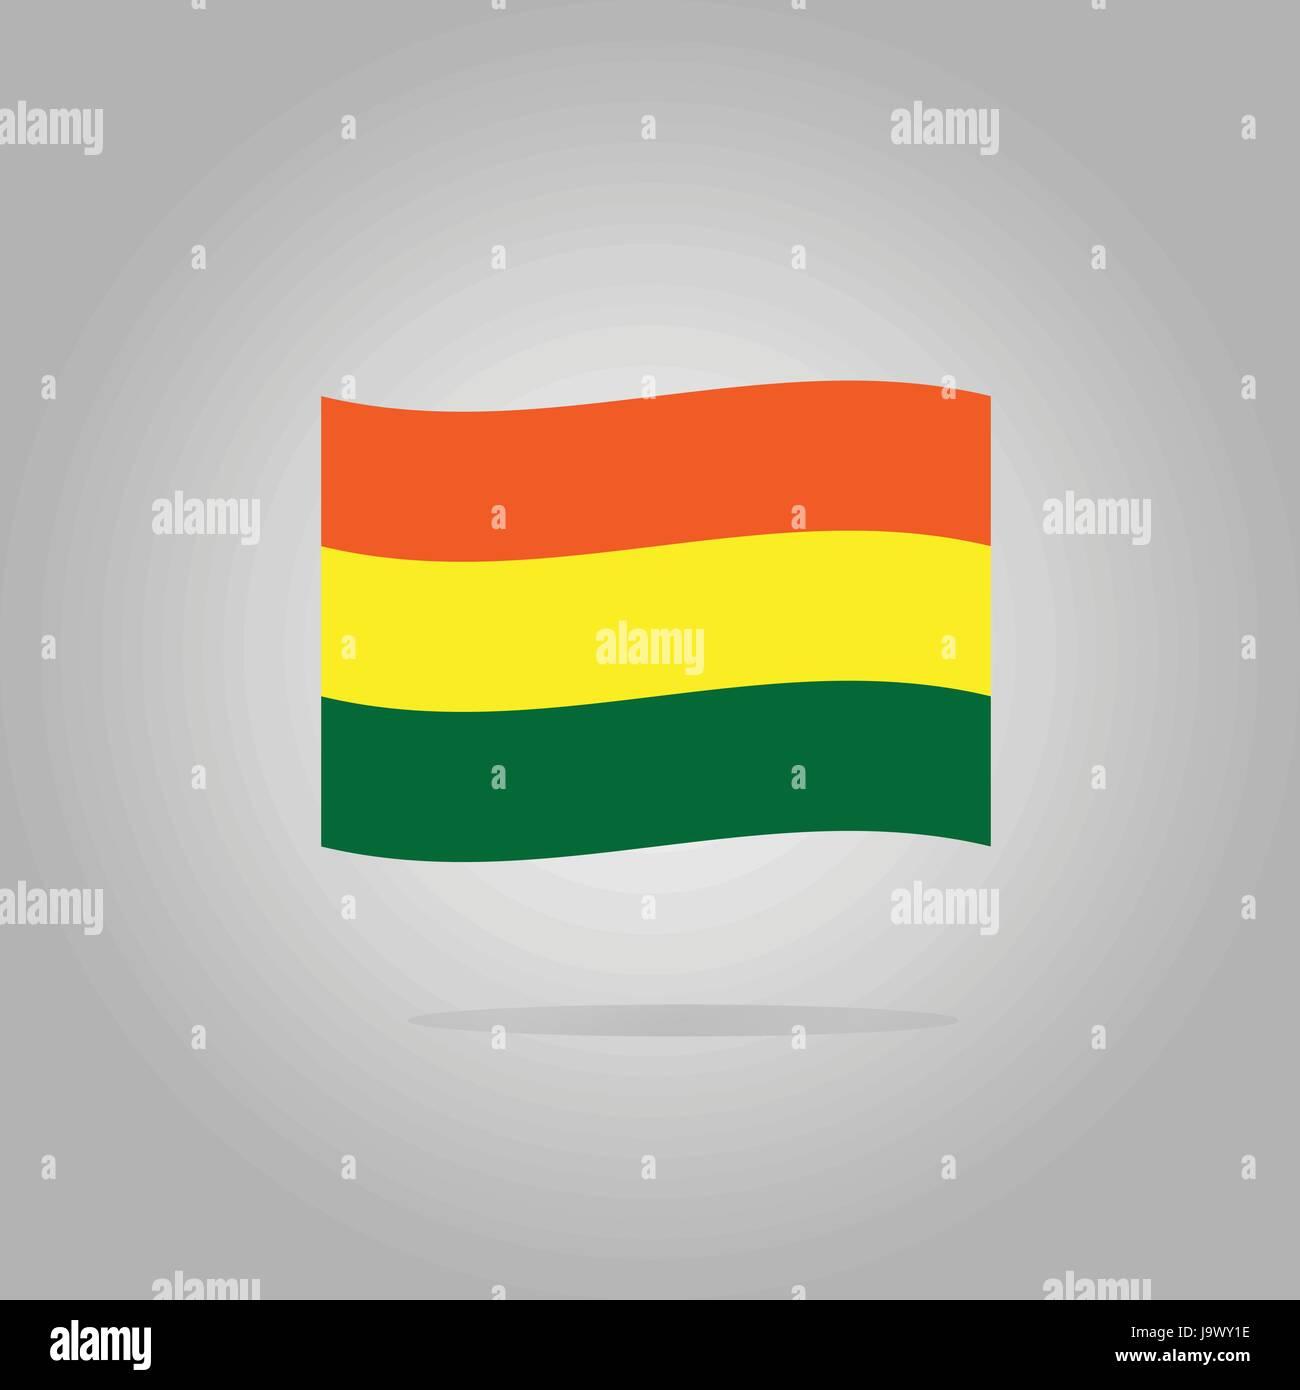 Bolivia flag design illustration - Stock Image